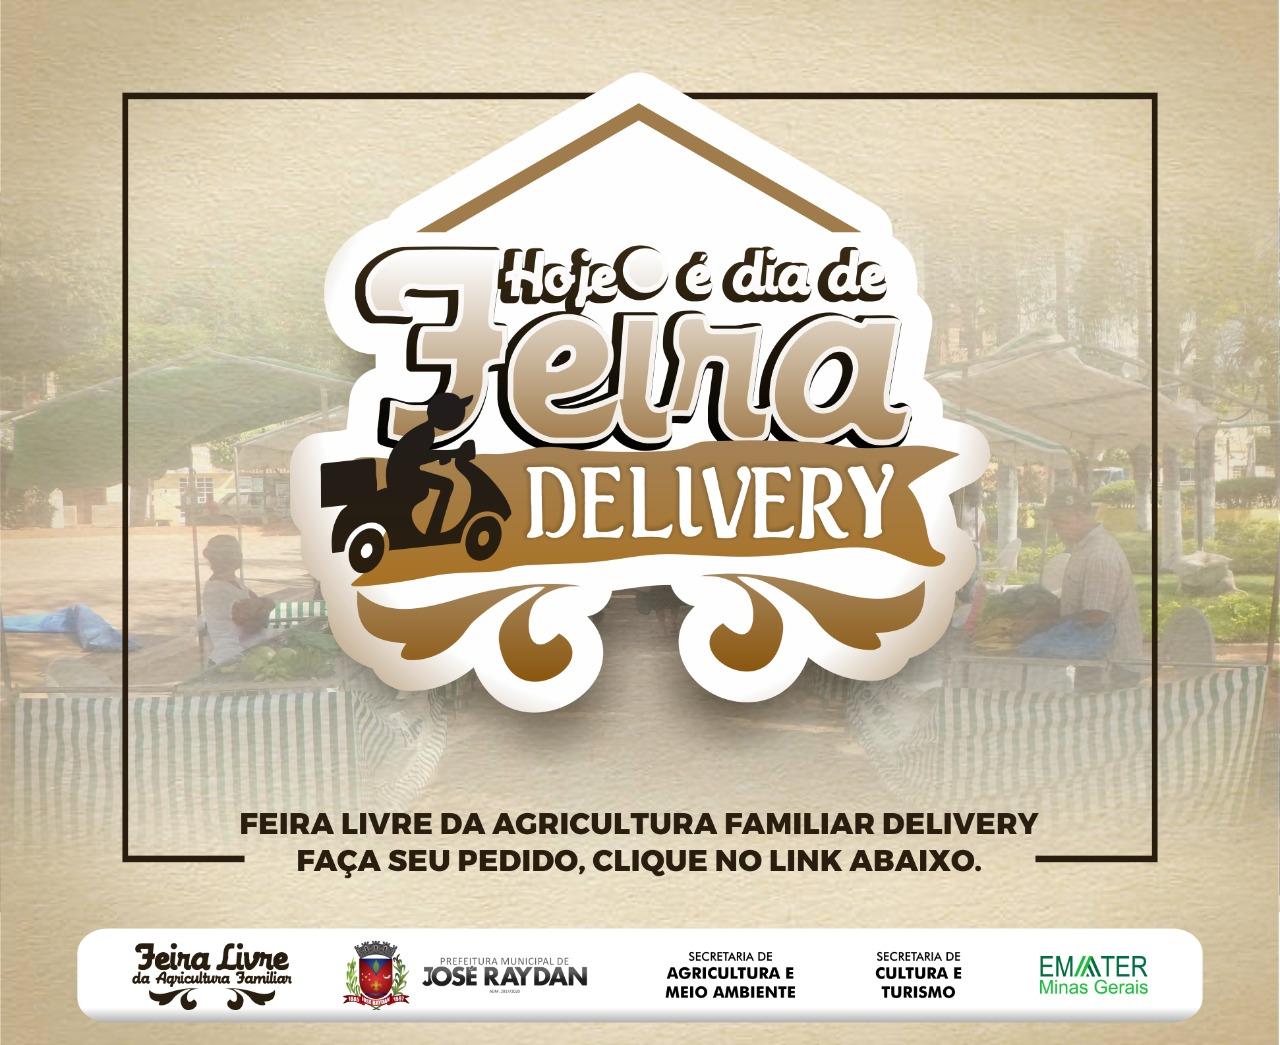 FEIRA DA AGRICULTURA FAMILIAR DELIVERY - JOSÉ RAYDAN/MG